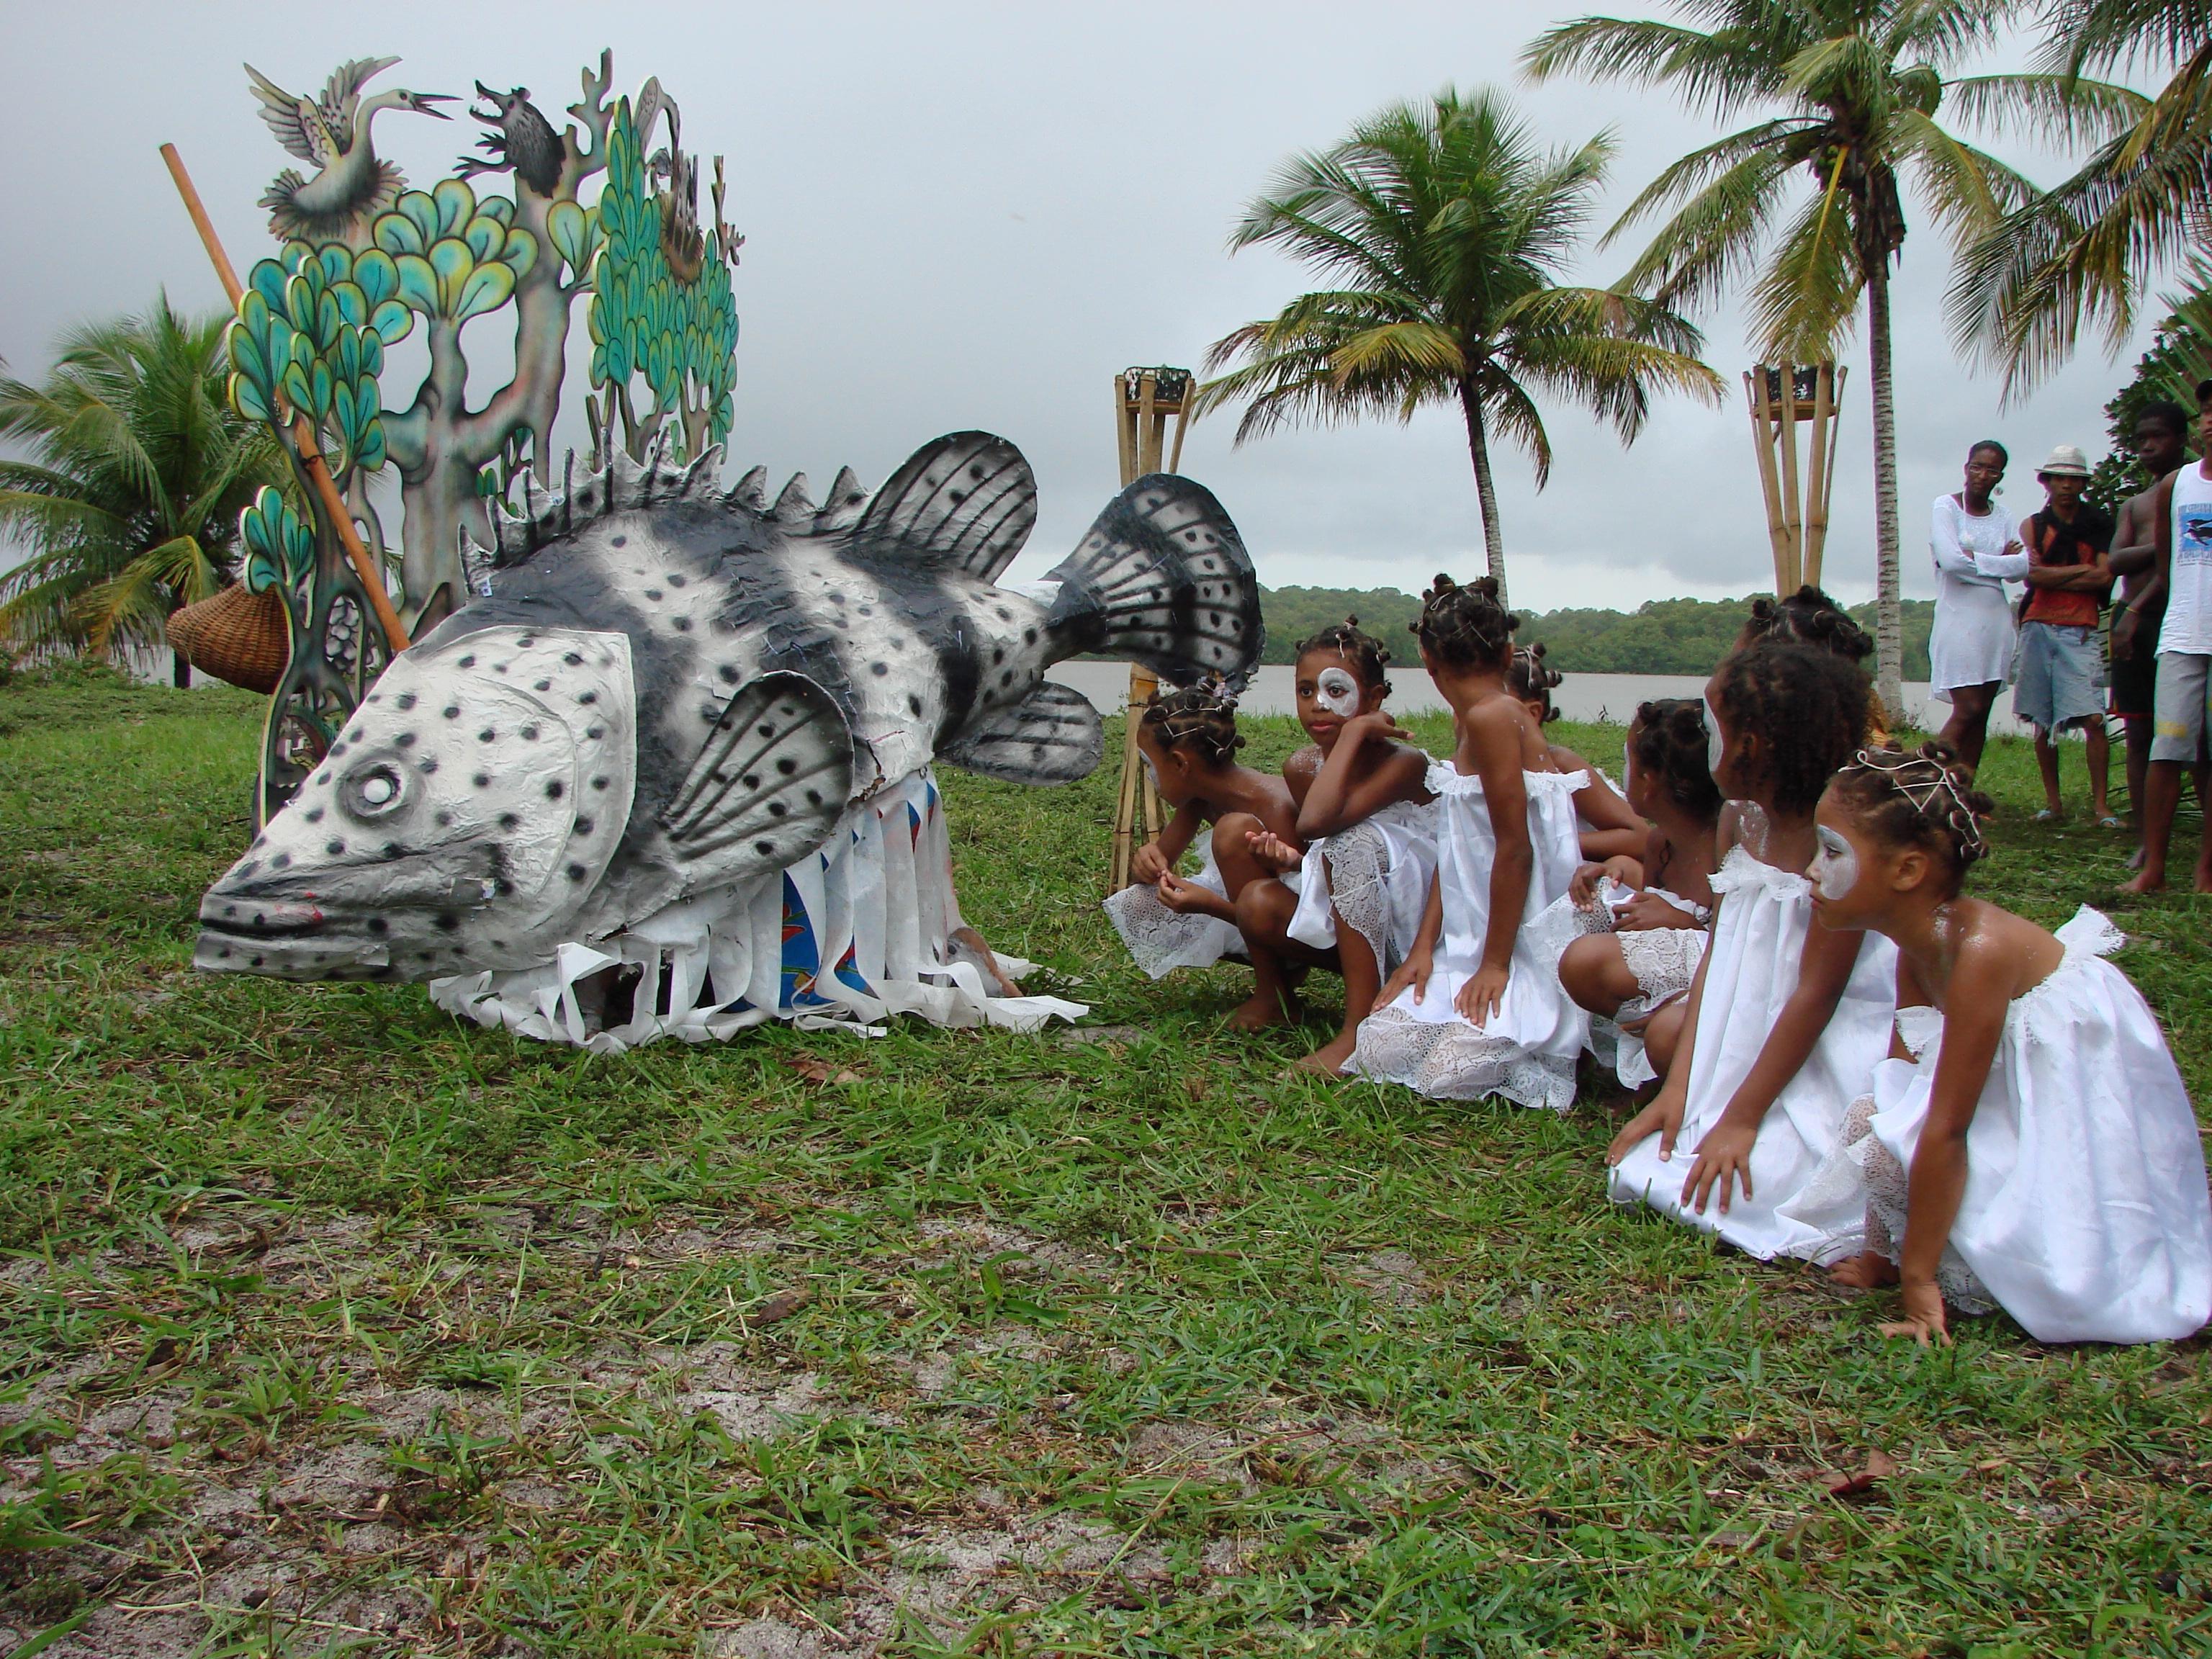 Espetáculo de cunho socioambiental - Movimento Cultural Arte e Manha - Caravelas - BA